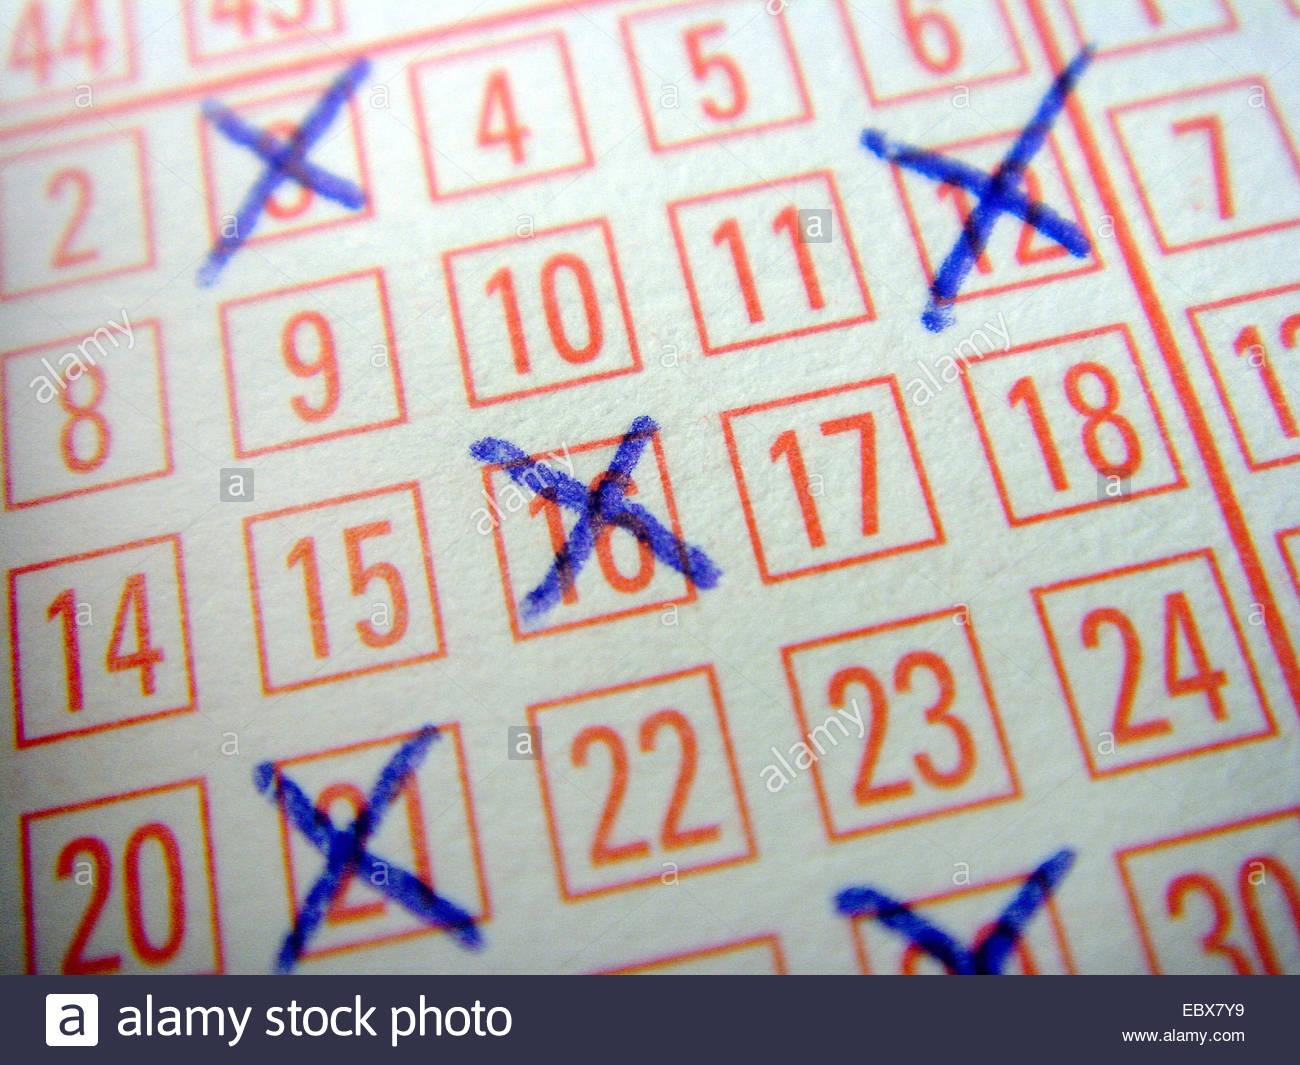 lottery bill - Stock Image